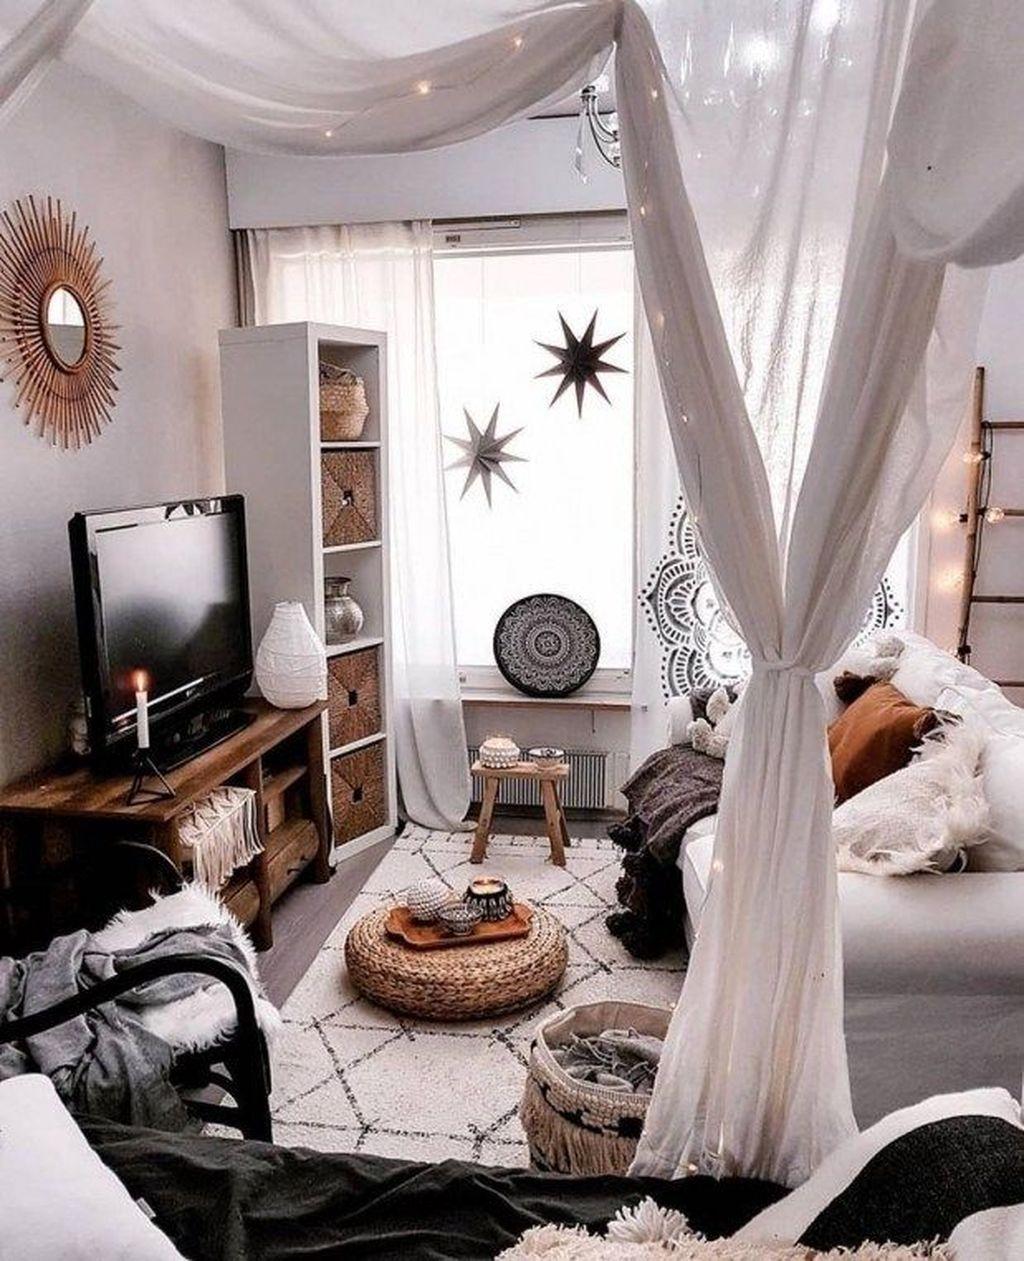 34 The Best Rustic Bohemian Living Room Decor Ideas ... on Bohemian Living Room Decor Ideas  id=98527